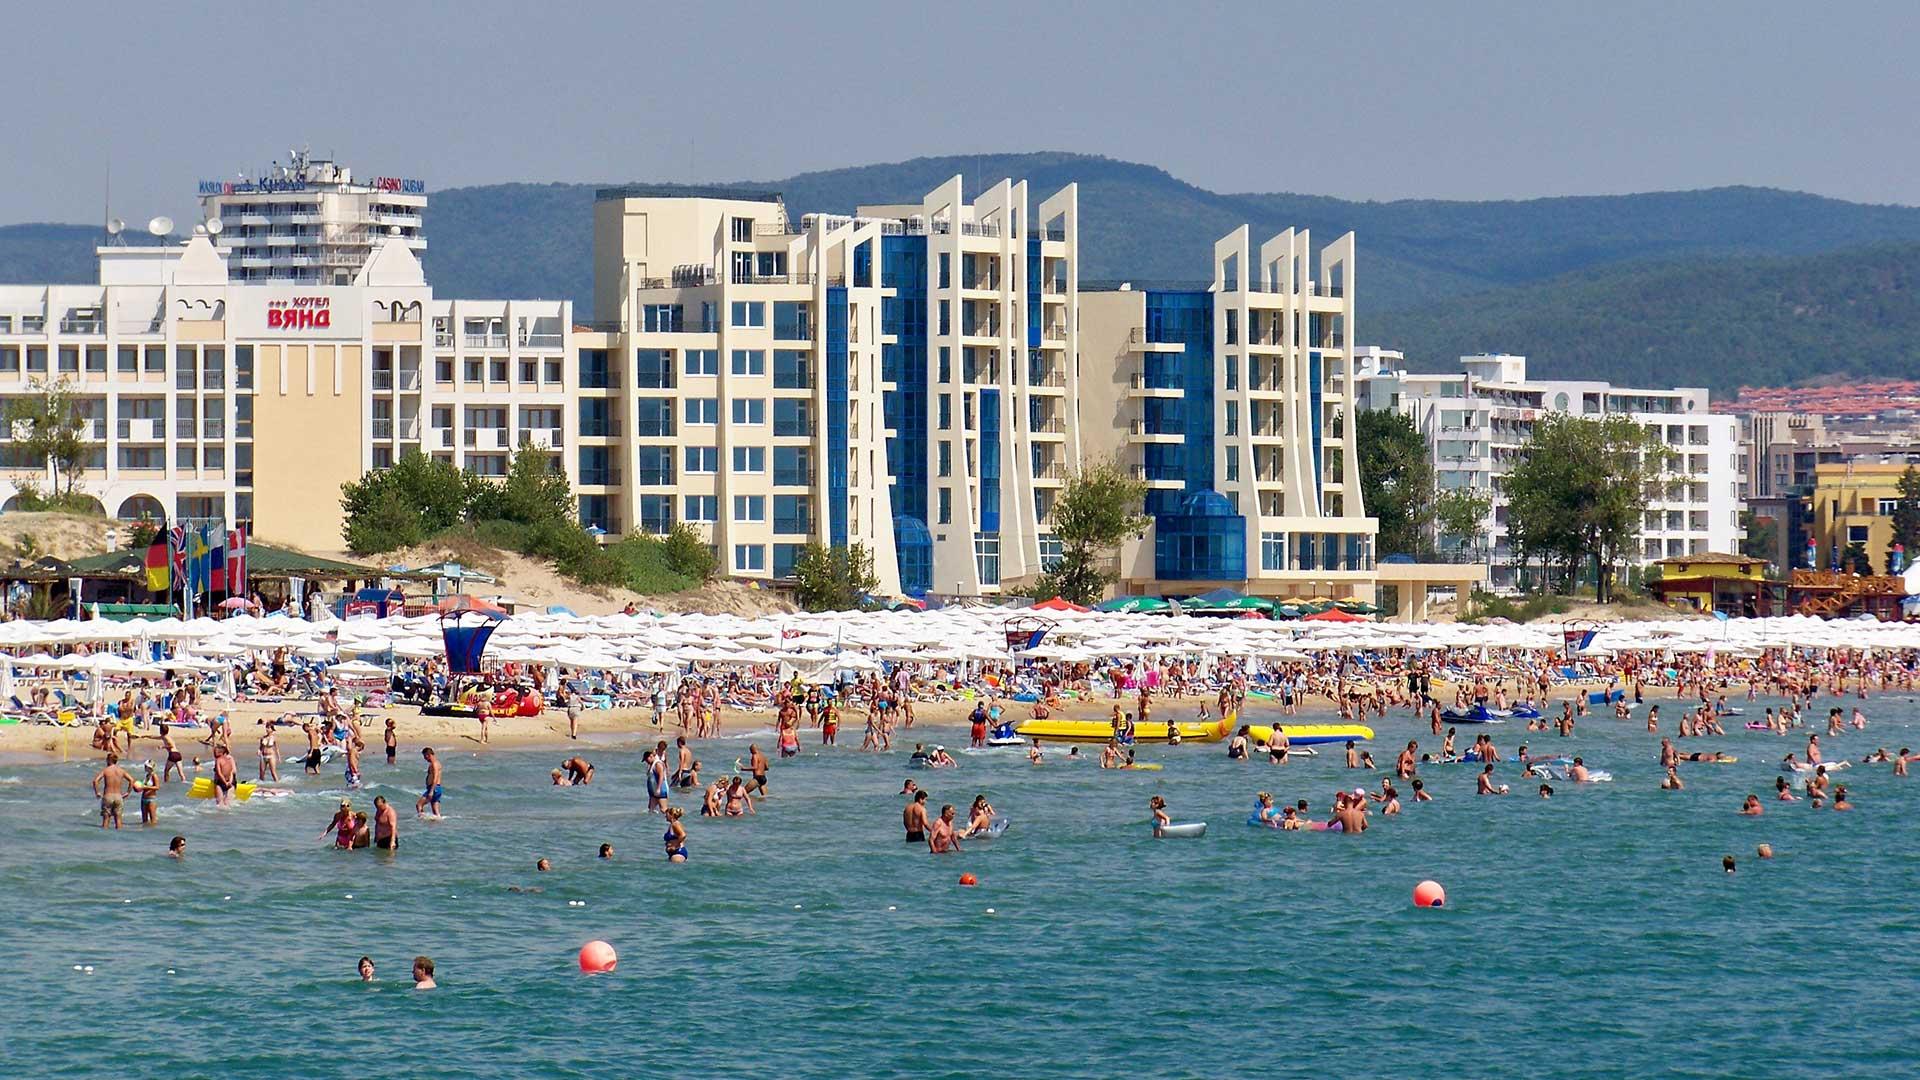 TransferTaxi-EUROPE | 4-Bulgaria-Sunny_Beach - TransferTaxi-EUROPE